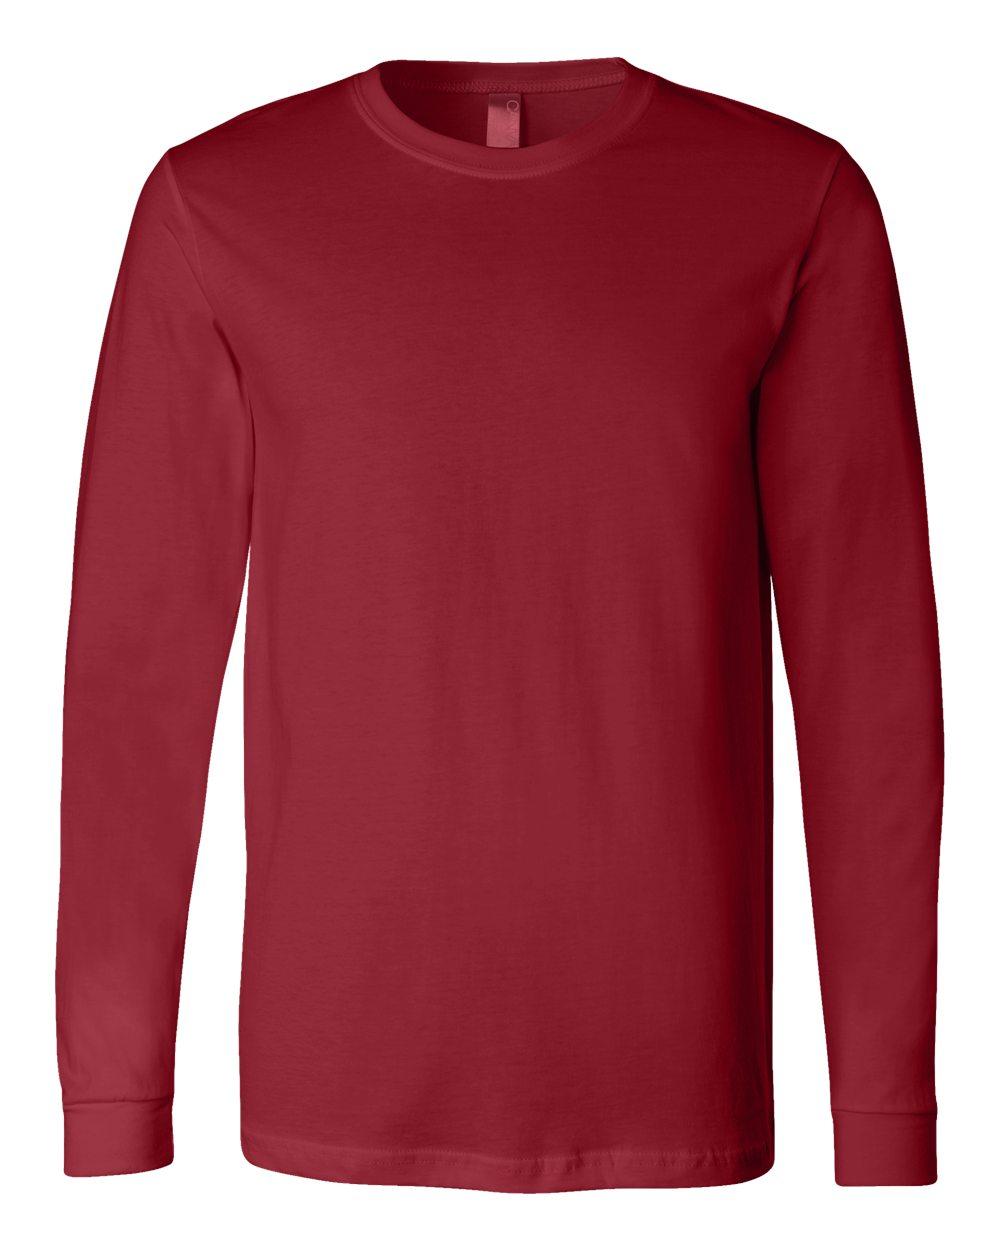 Bella-Canvas-Mens-Blank-Top-Long-Sleeve-Jersey-Tee-T-Shirt-3501-up-to-3XL thumbnail 27